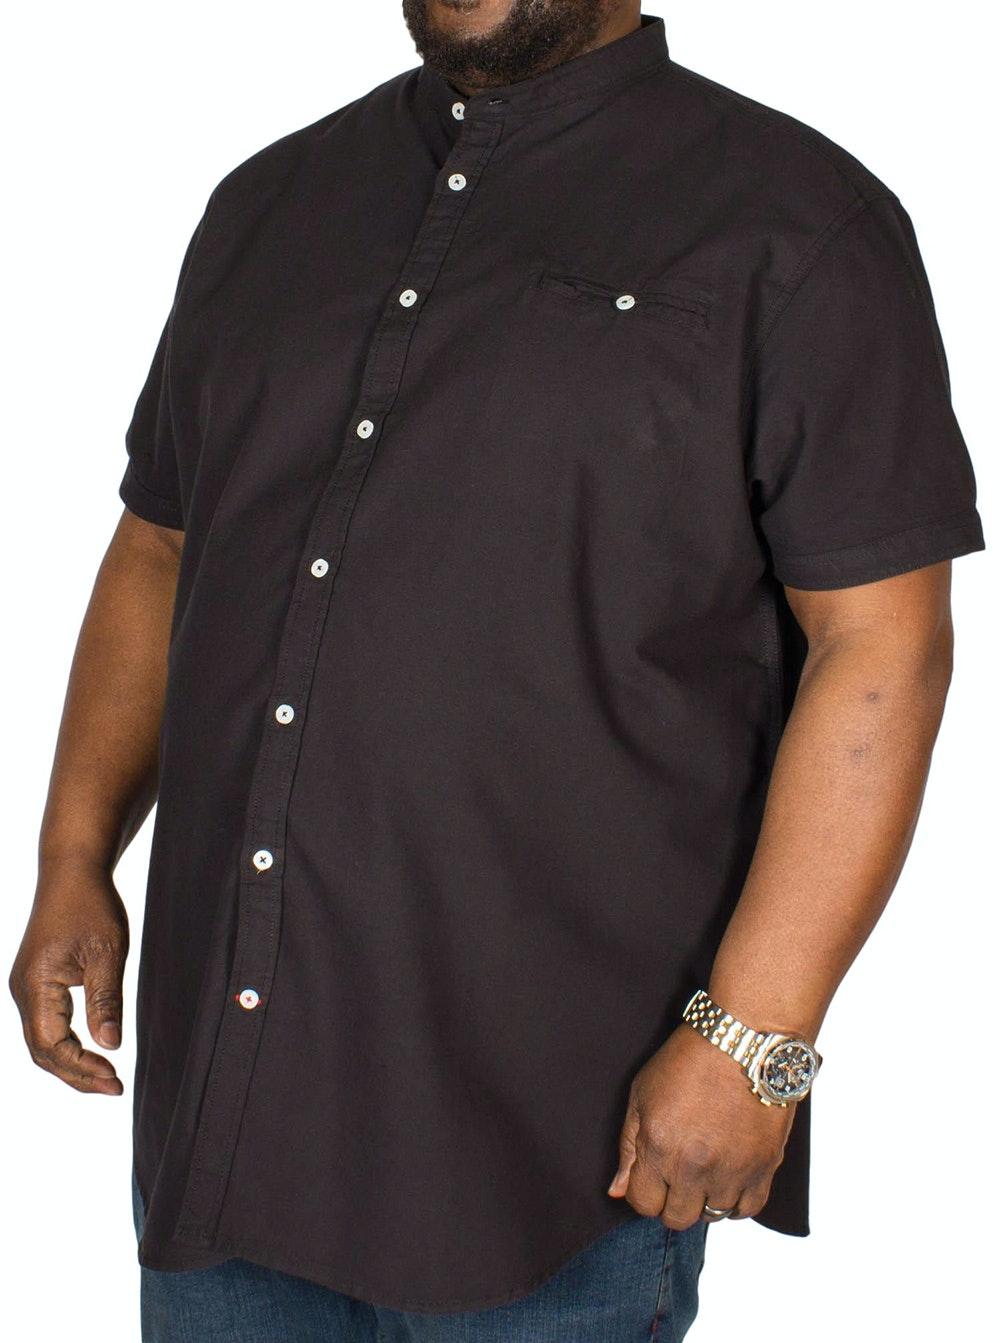 D555 Dwight Oxford Collarless Shirt Black